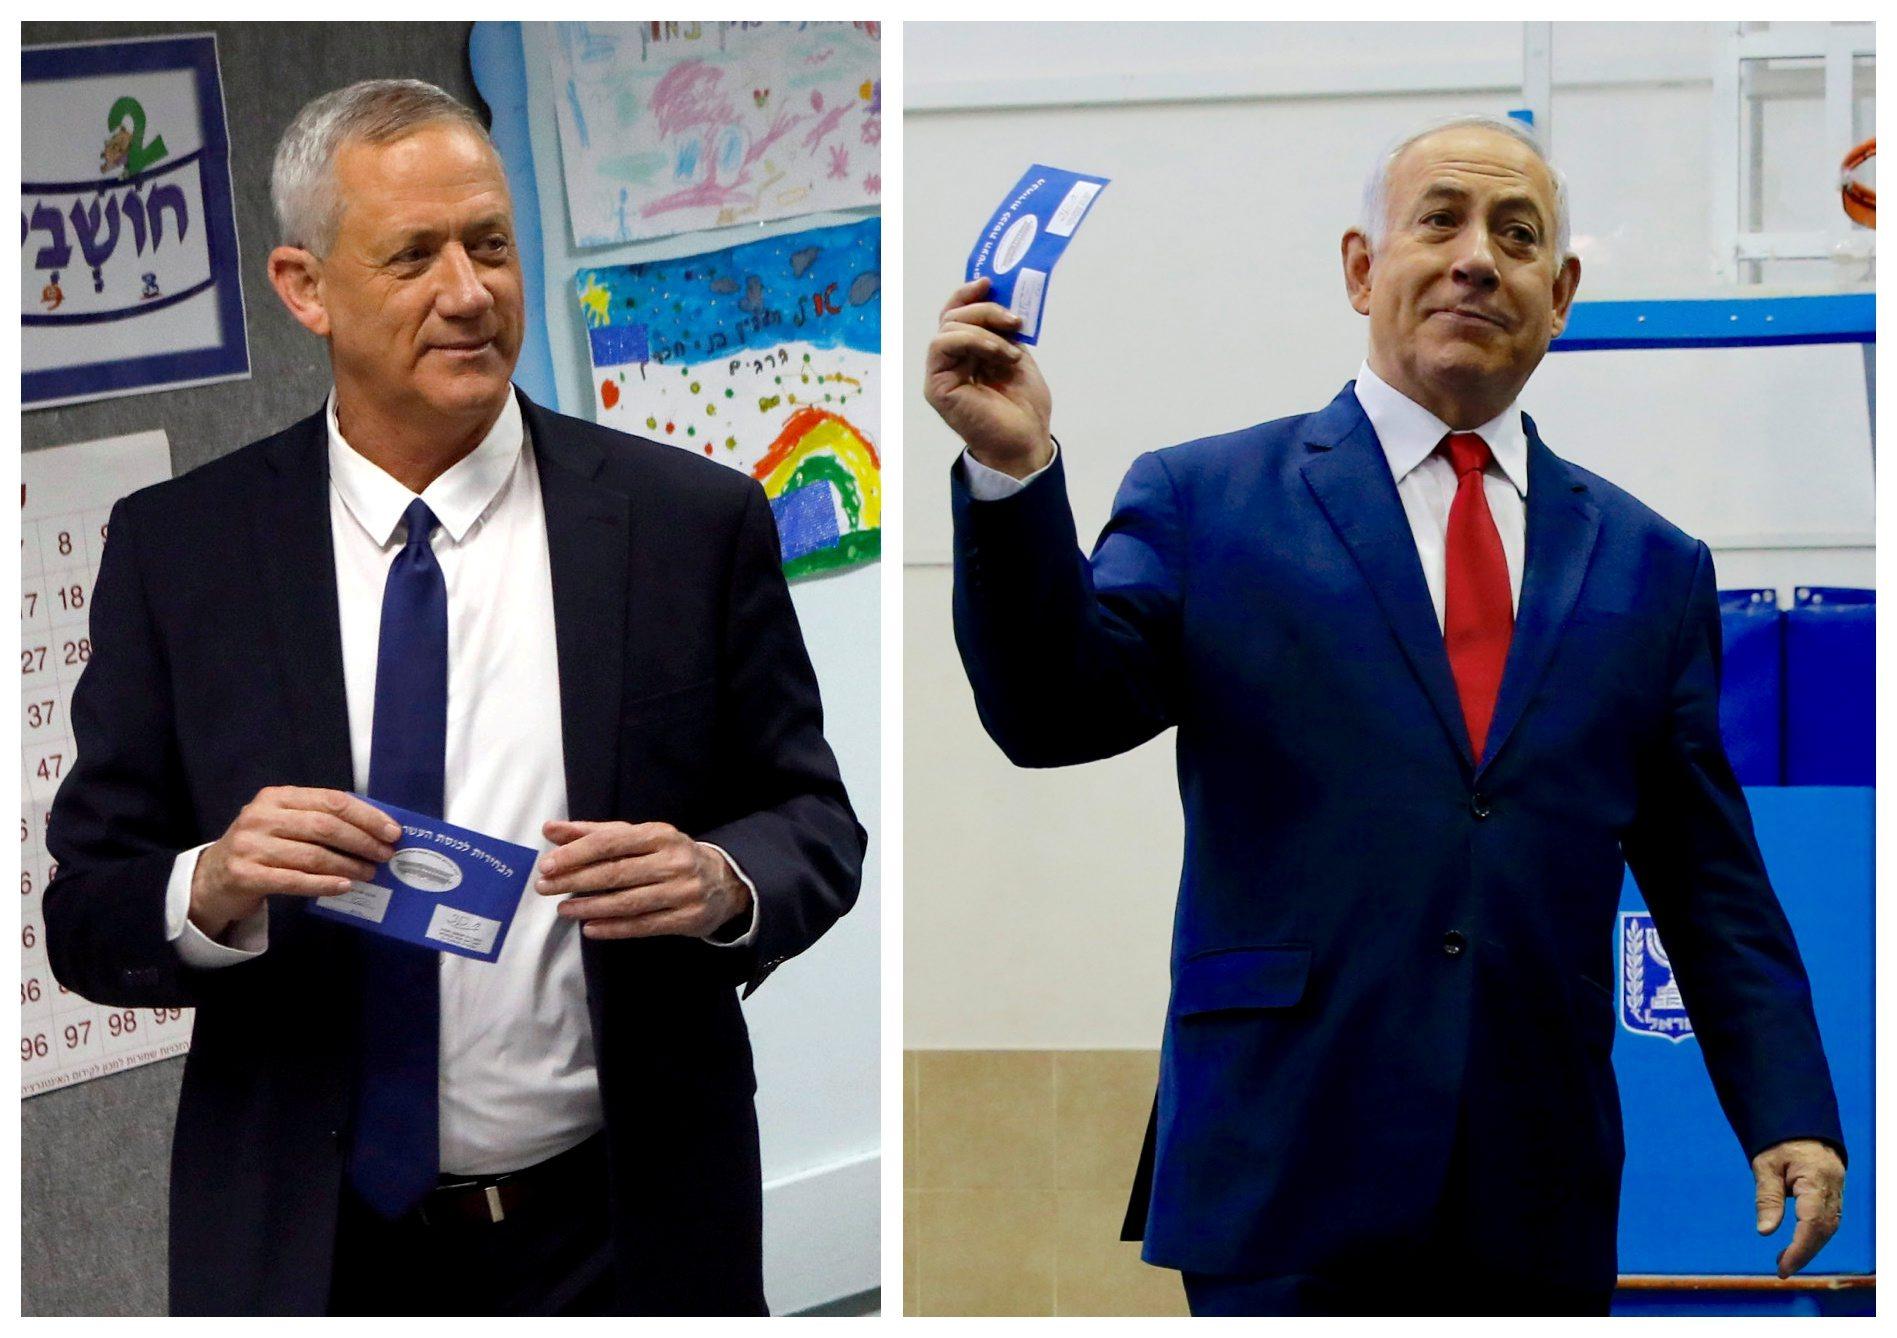 2019-04-09T113746Z_1911329507_RC122F5D90F0_RTRMADP_3_ISRAEL-ELECTION